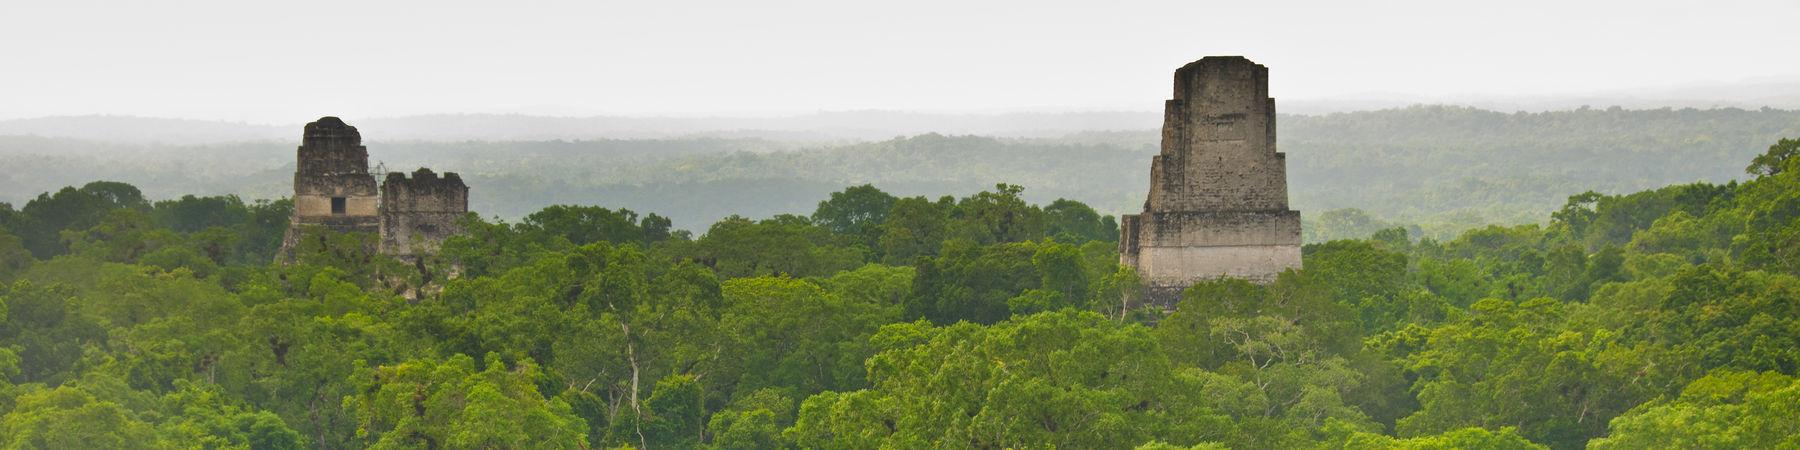 1800px-Tikal_Banner